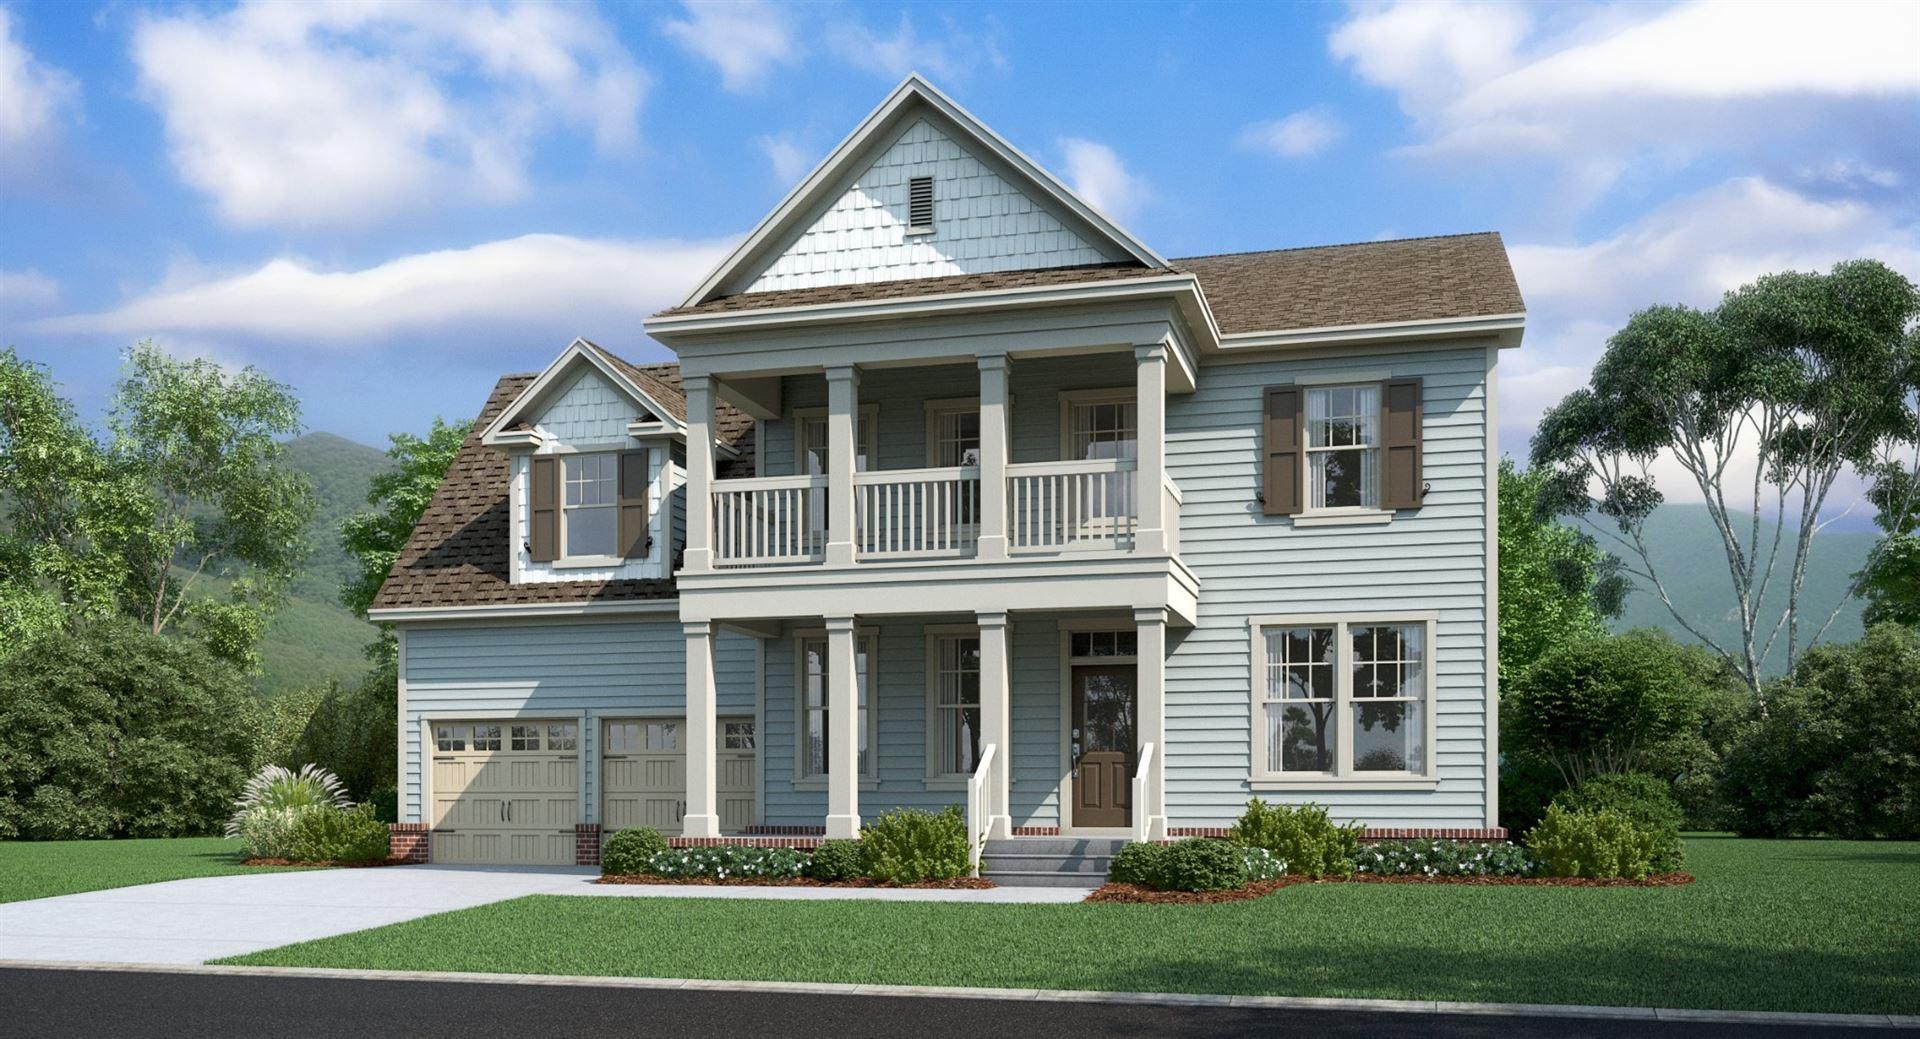 712 Westchester Circle #619, Hendersonville, TN 37075 - MLS#: 2199655